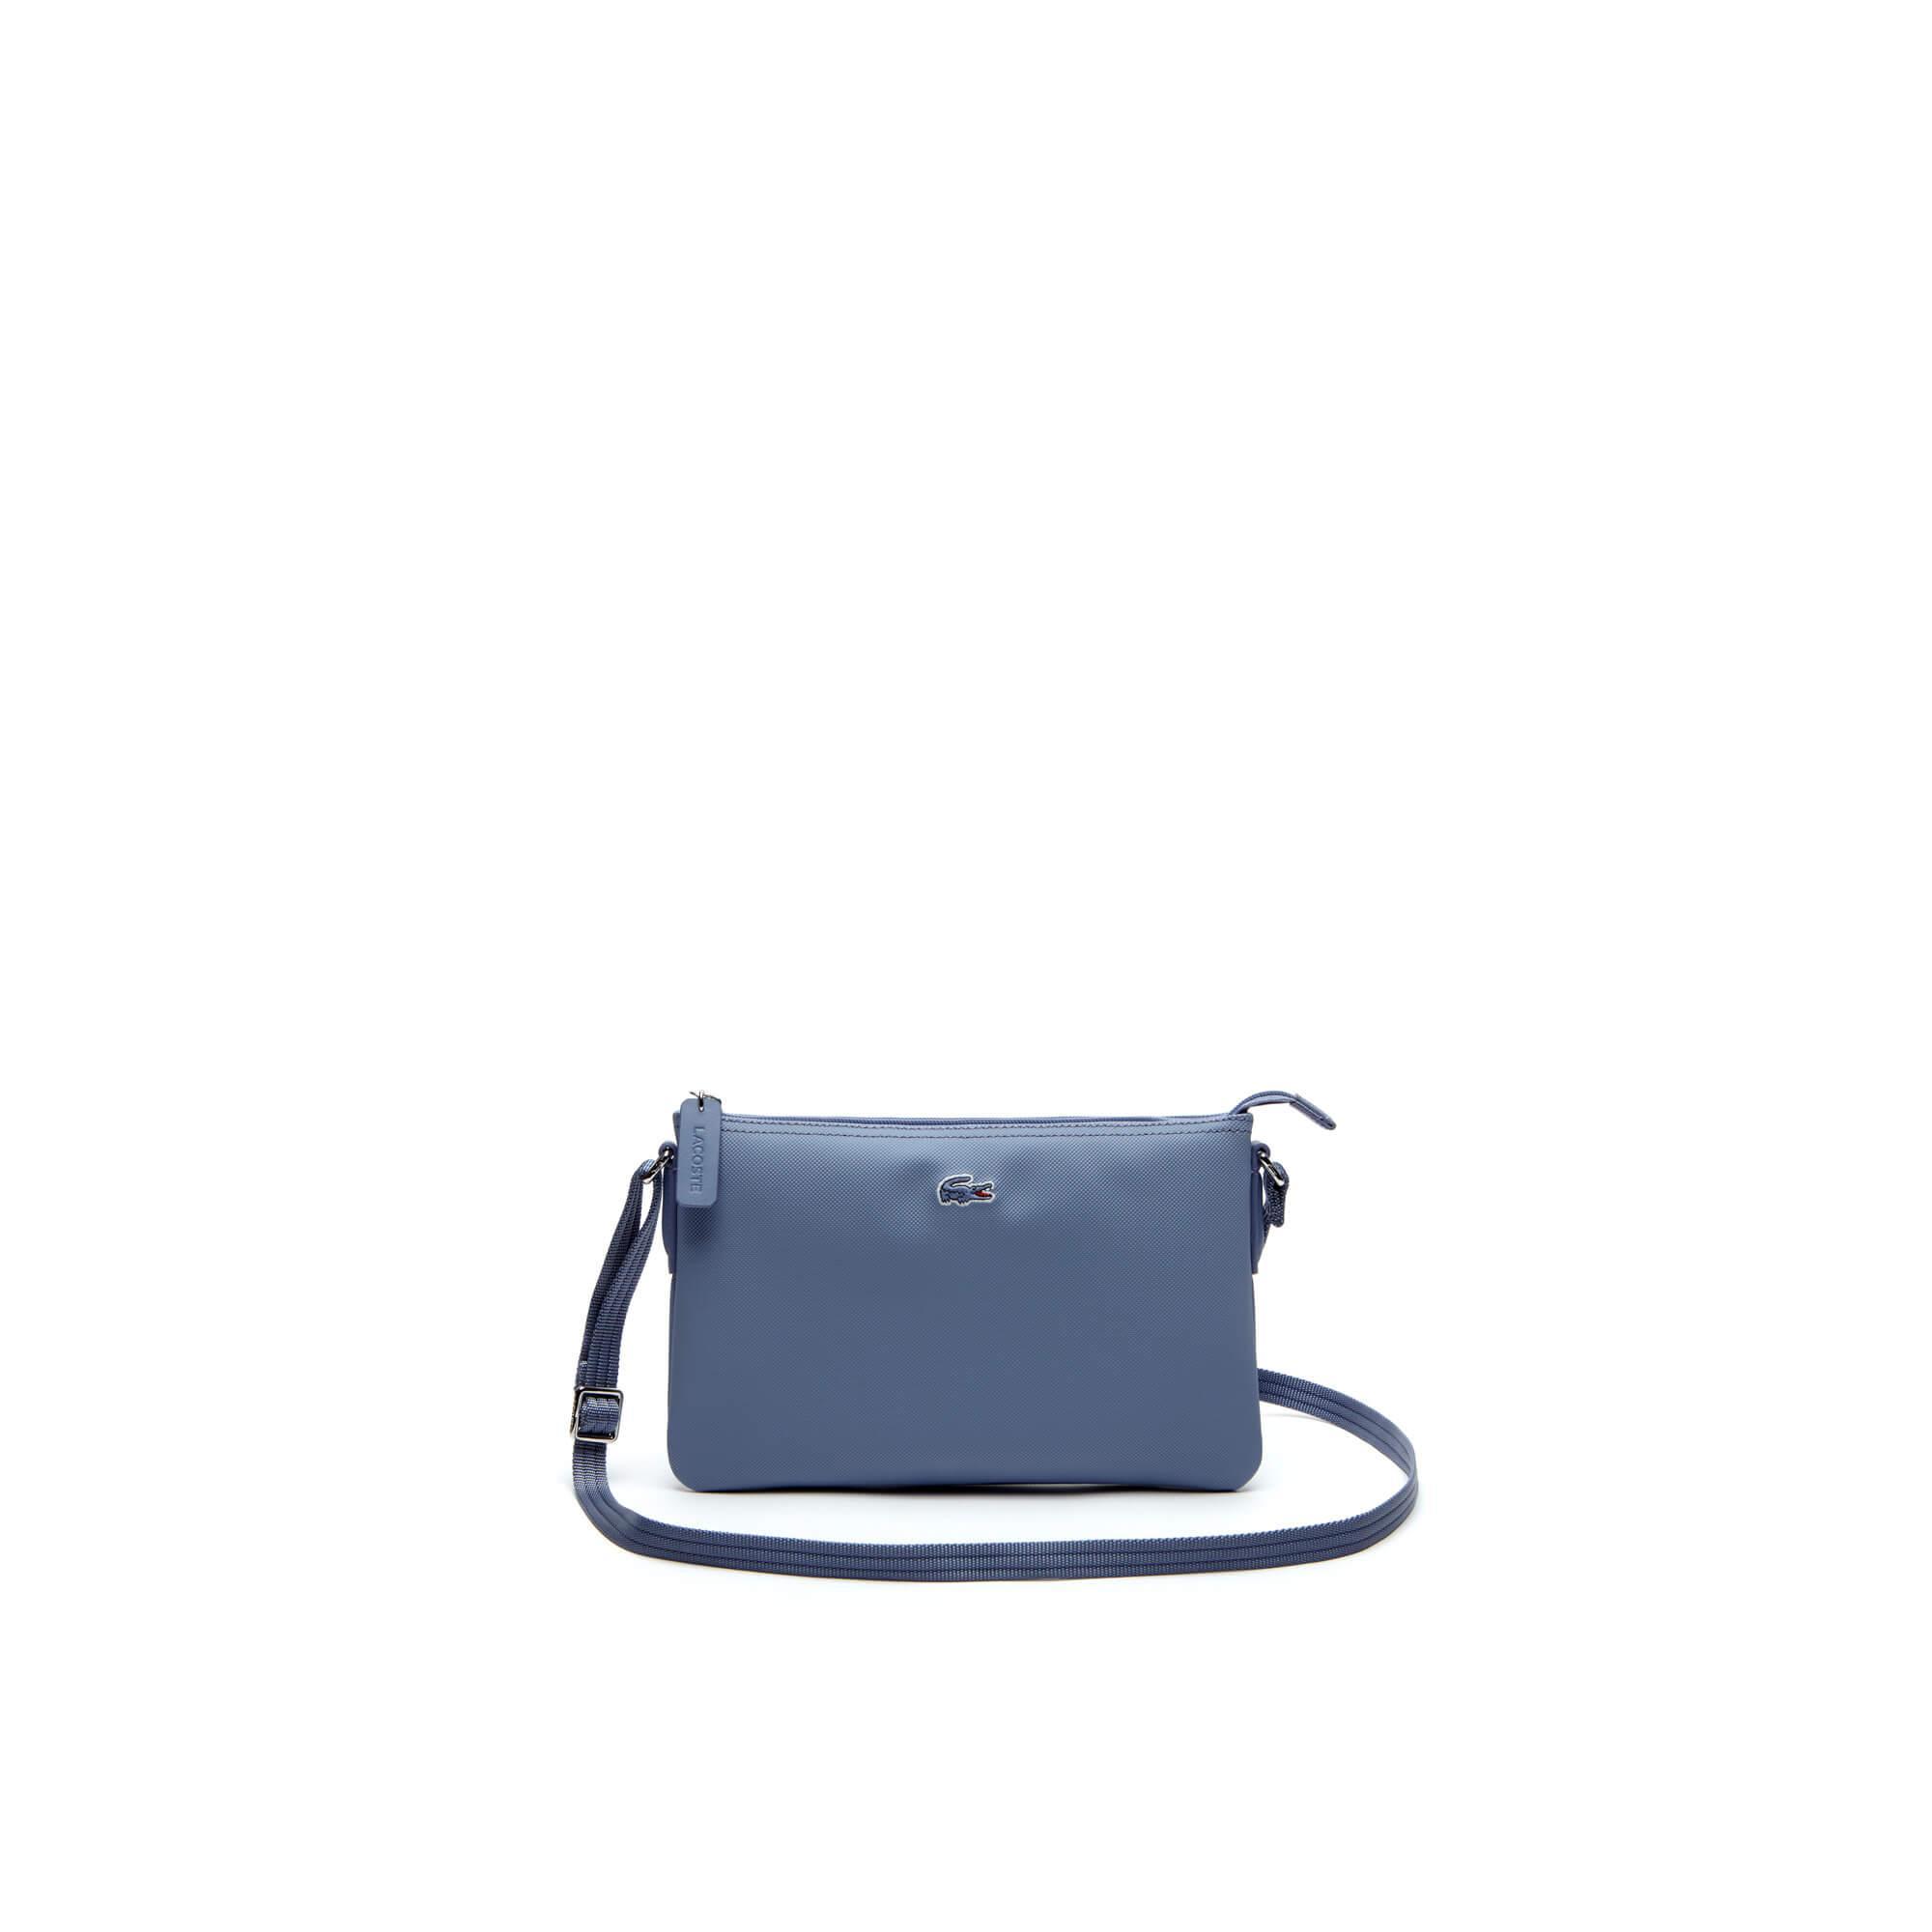 Lacoste Kadın L.12.12 Concept Mavi Çanta